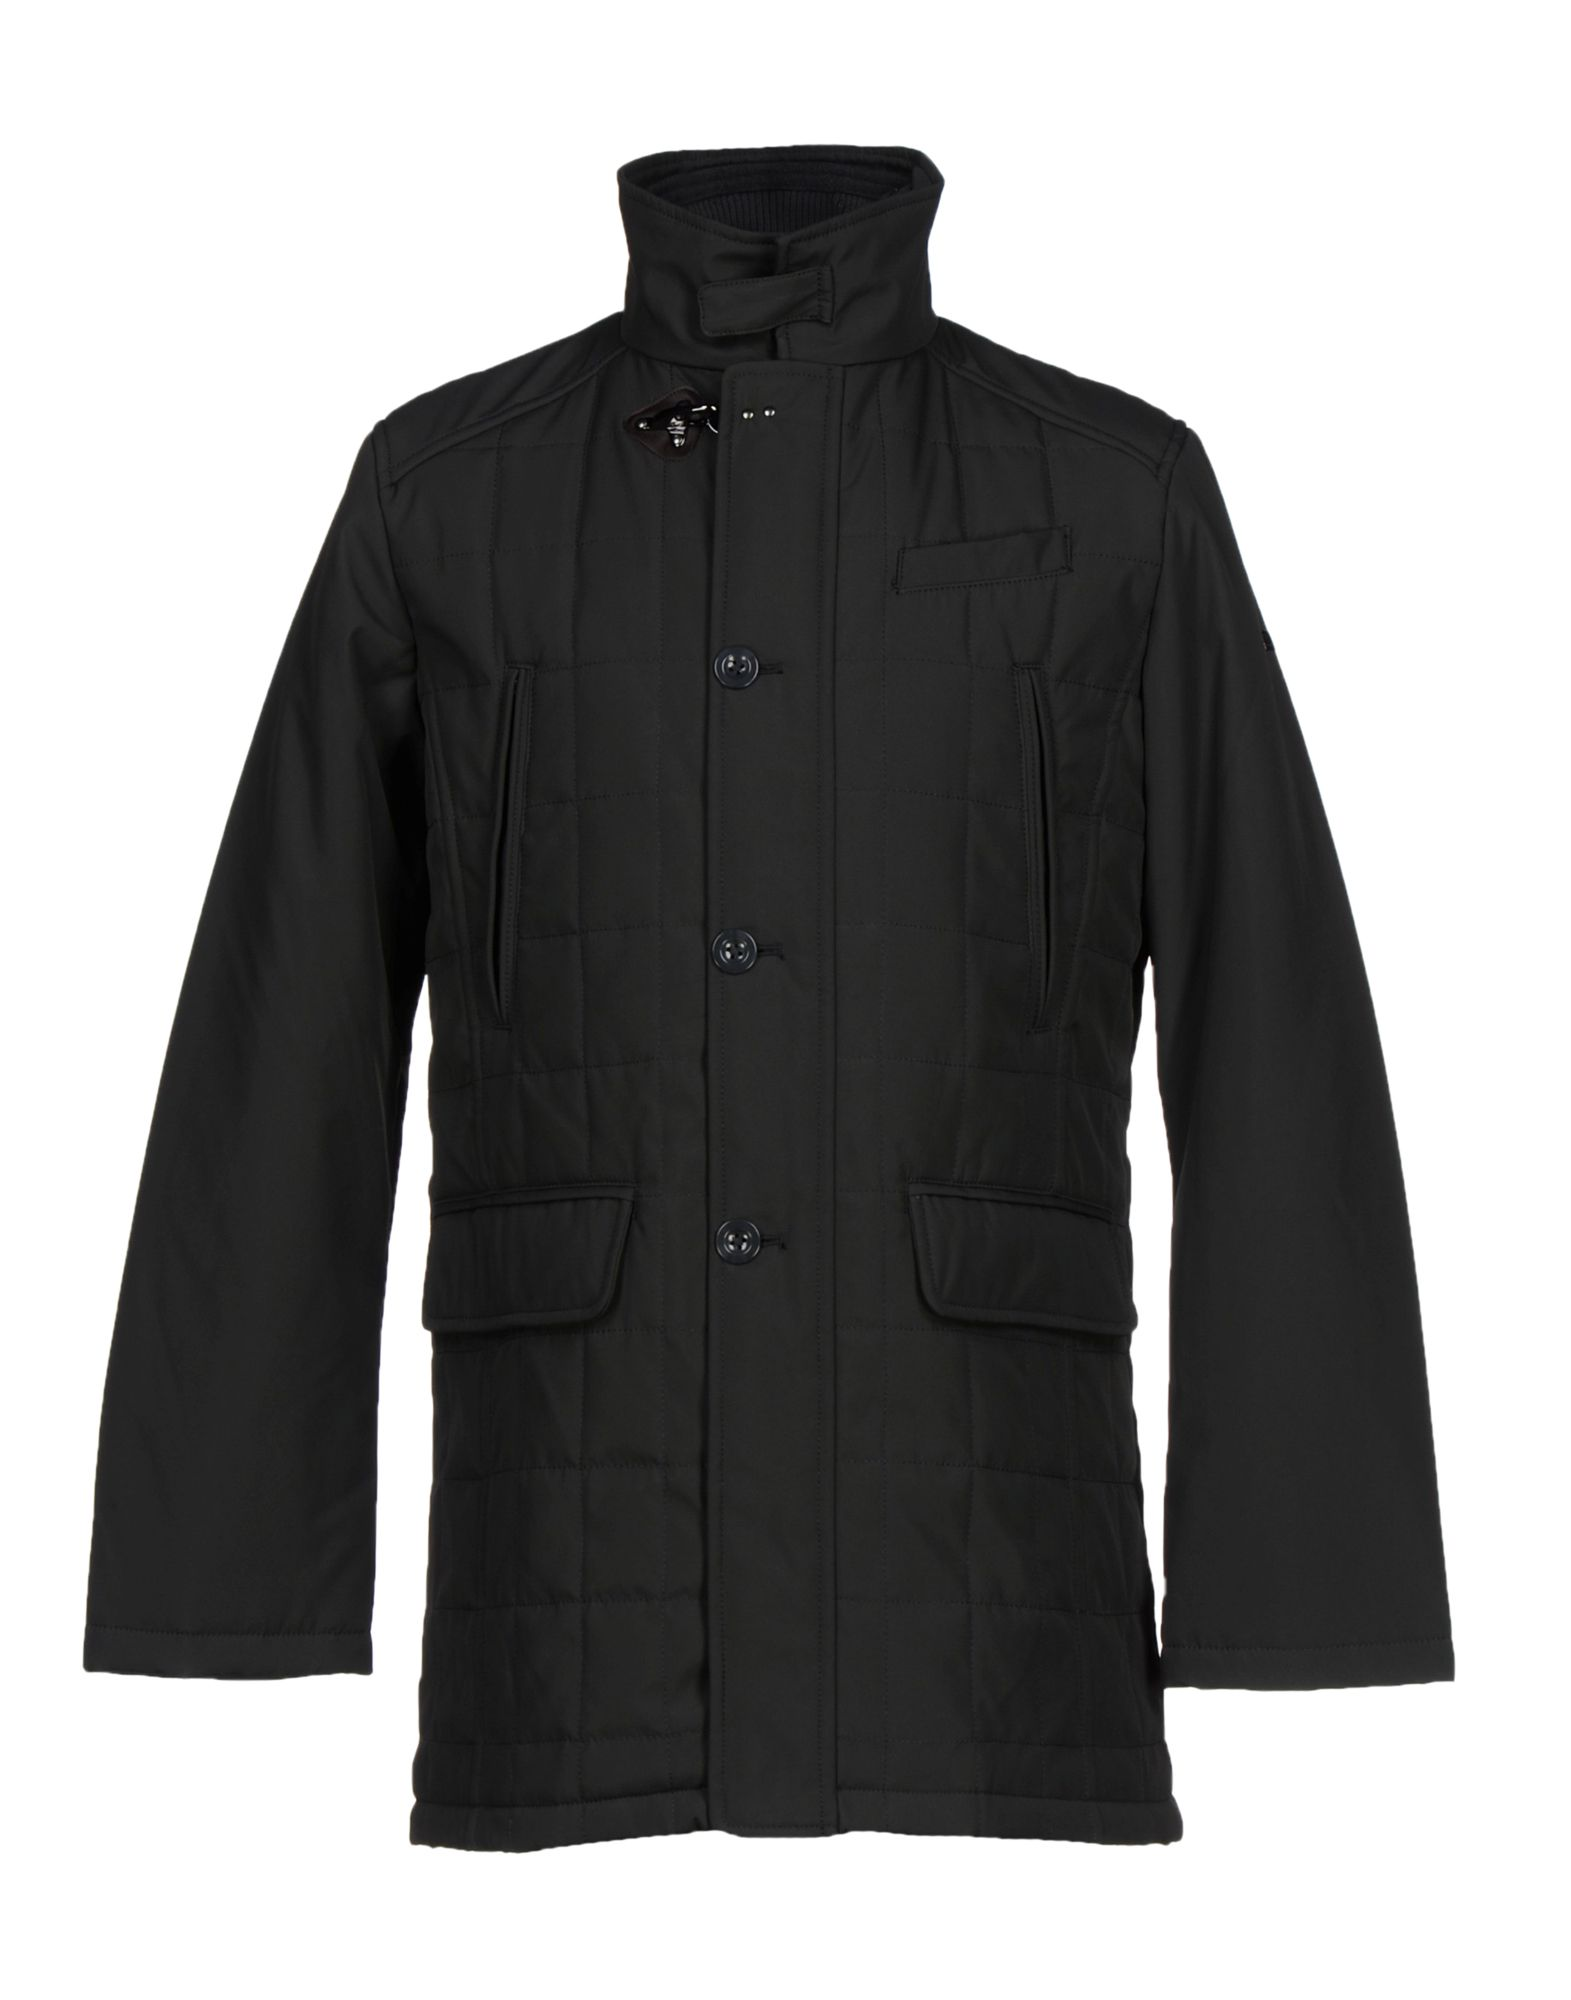 все цены на IVY Куртка онлайн